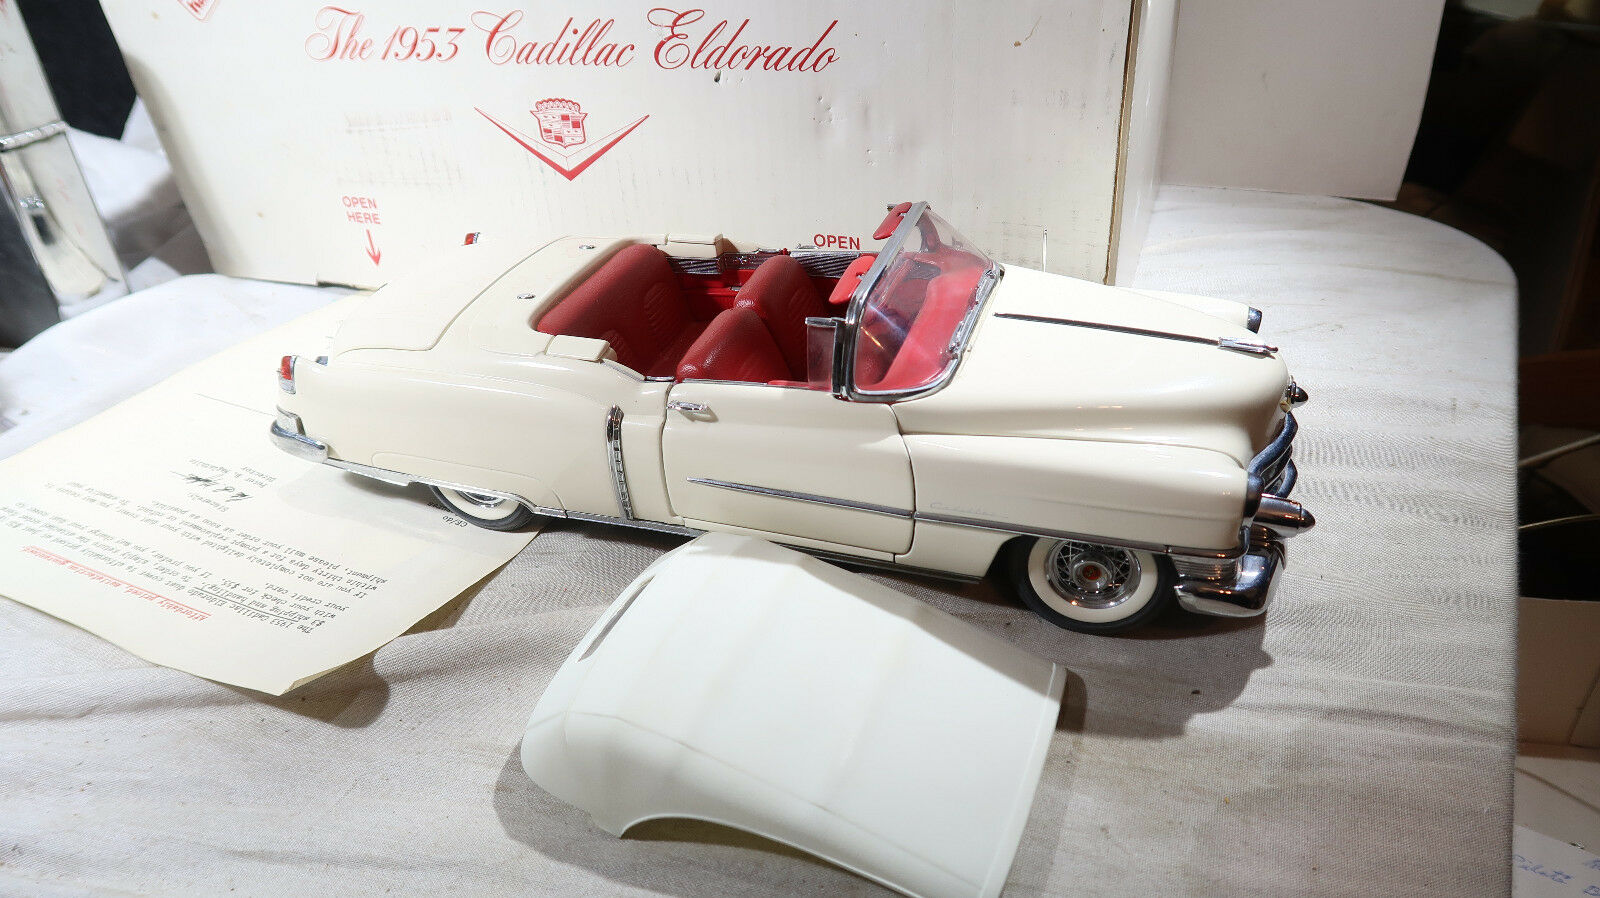 Danbury Mint 1953 Cadillac Eldorado 1 16 En Caja